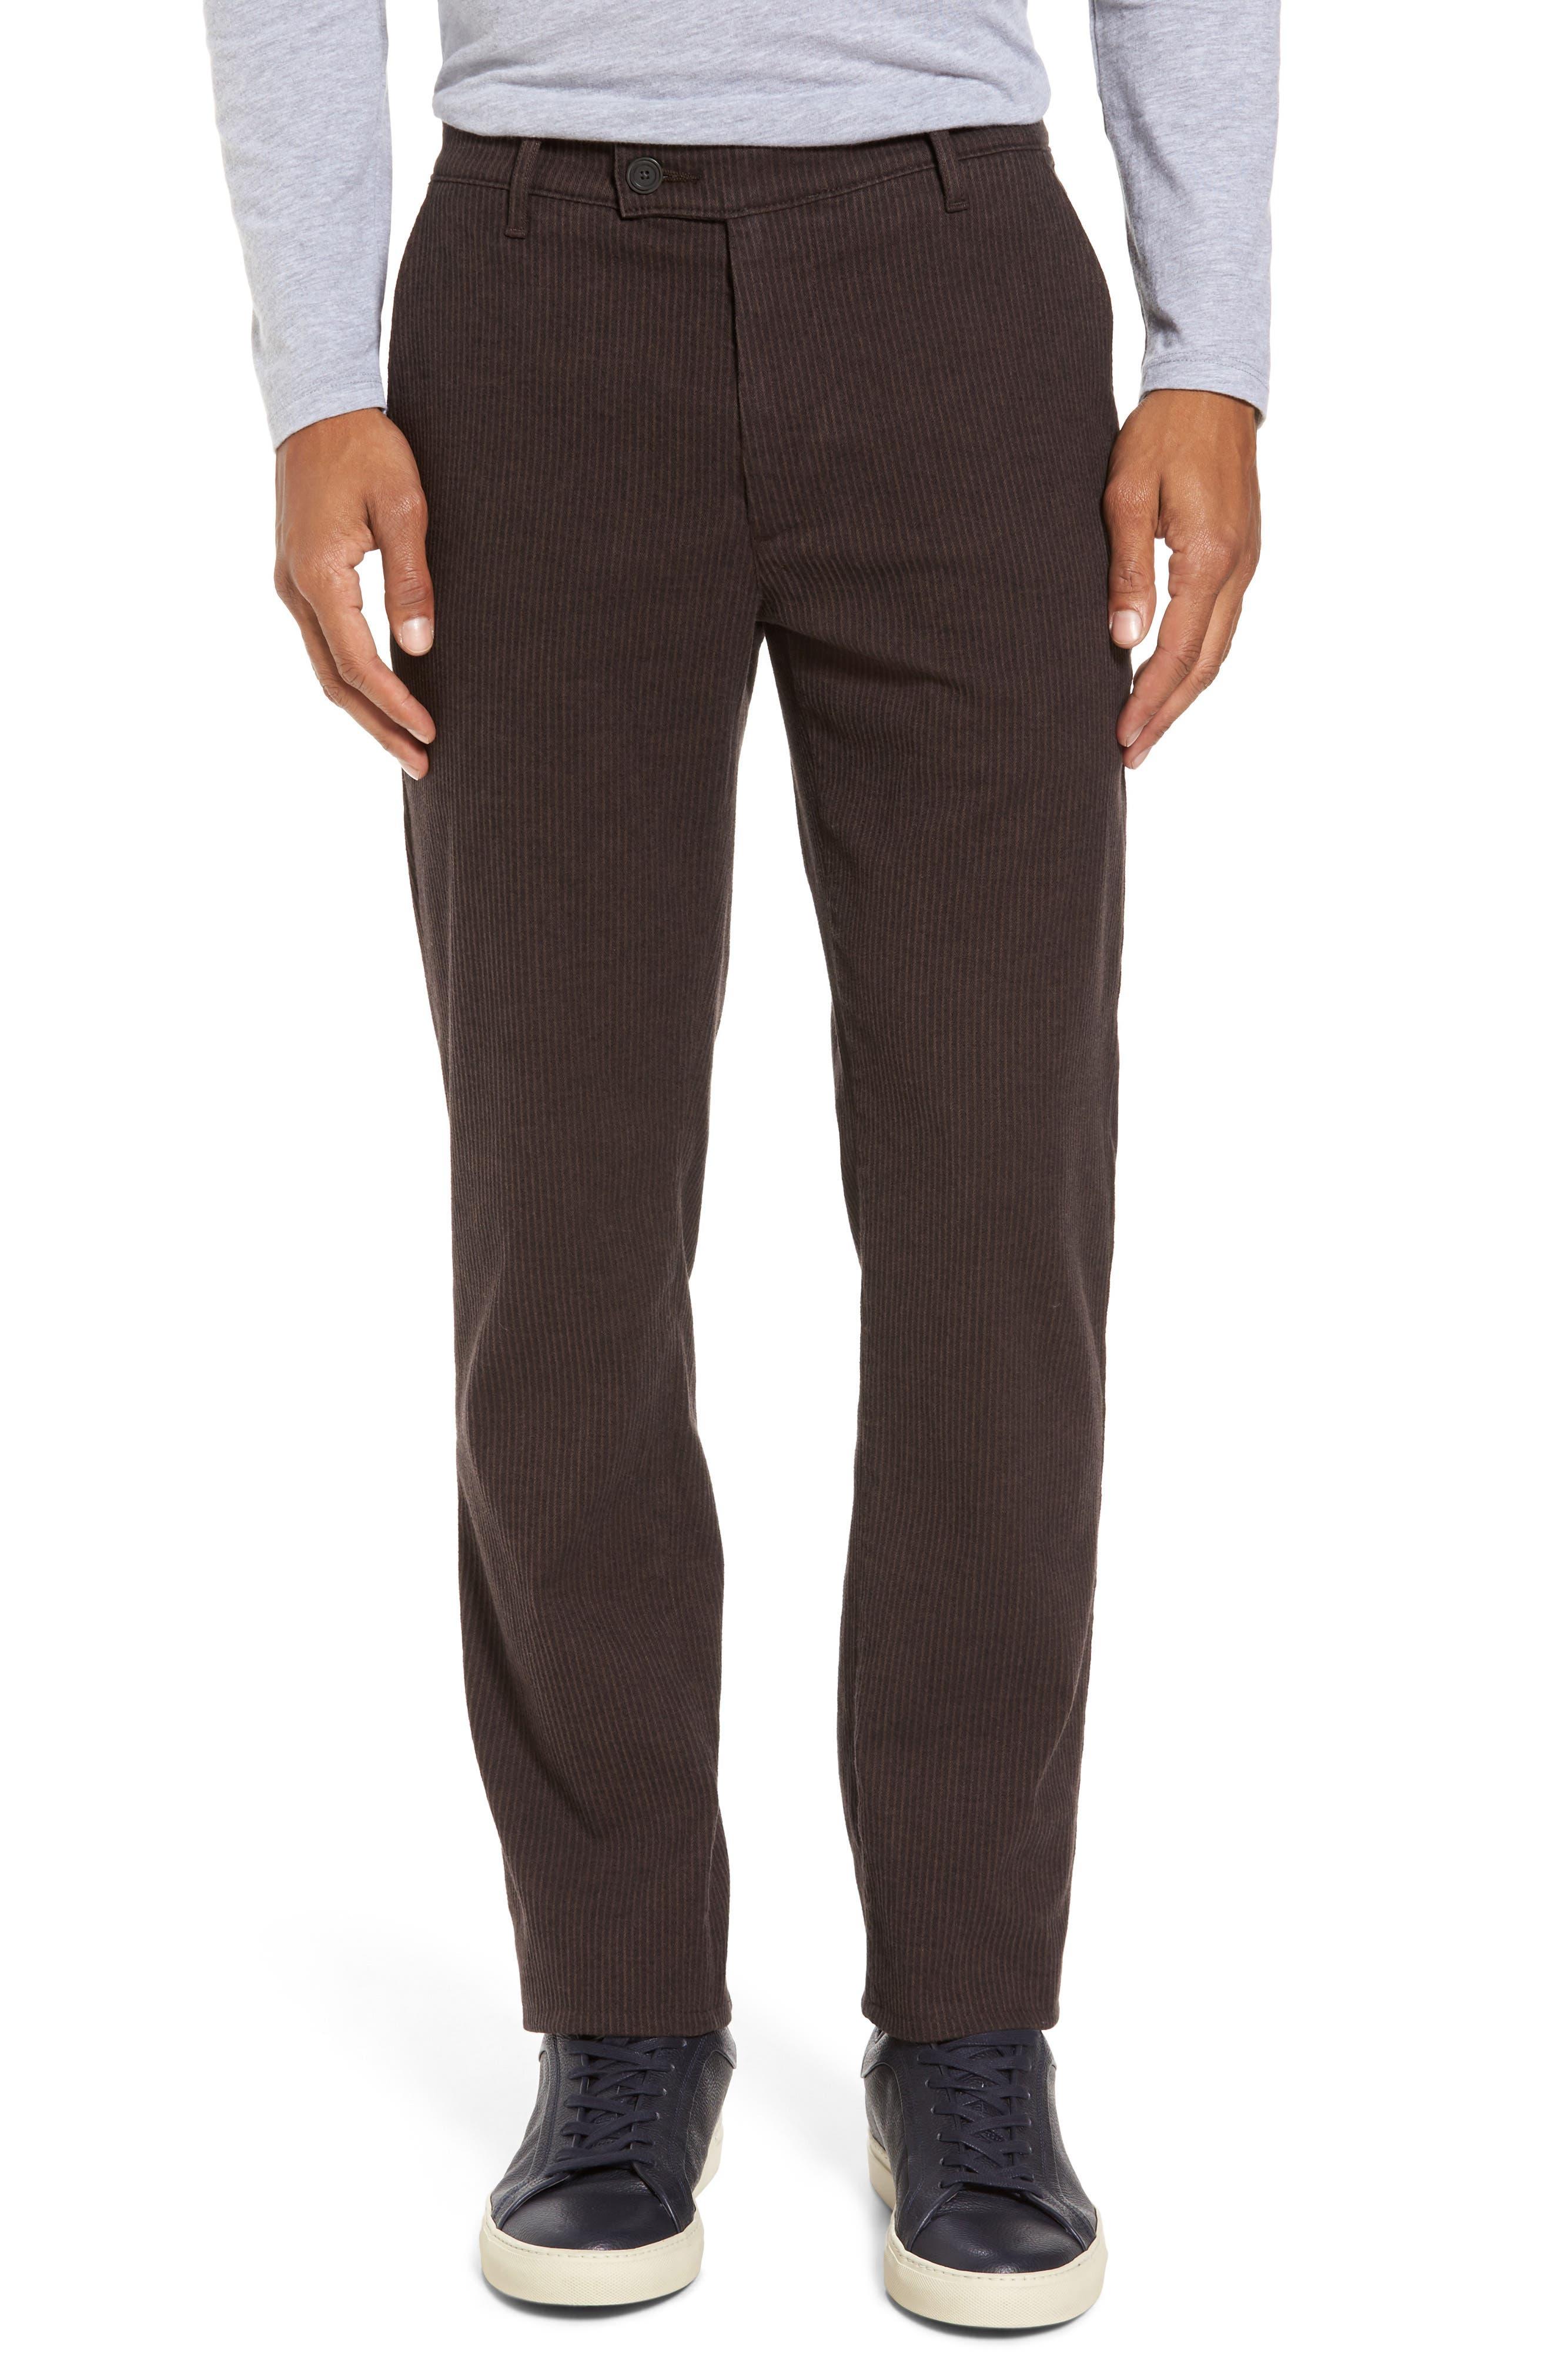 Marshall Slim Fit Pinstripe Pants,                         Main,                         color, Dark Oakwood